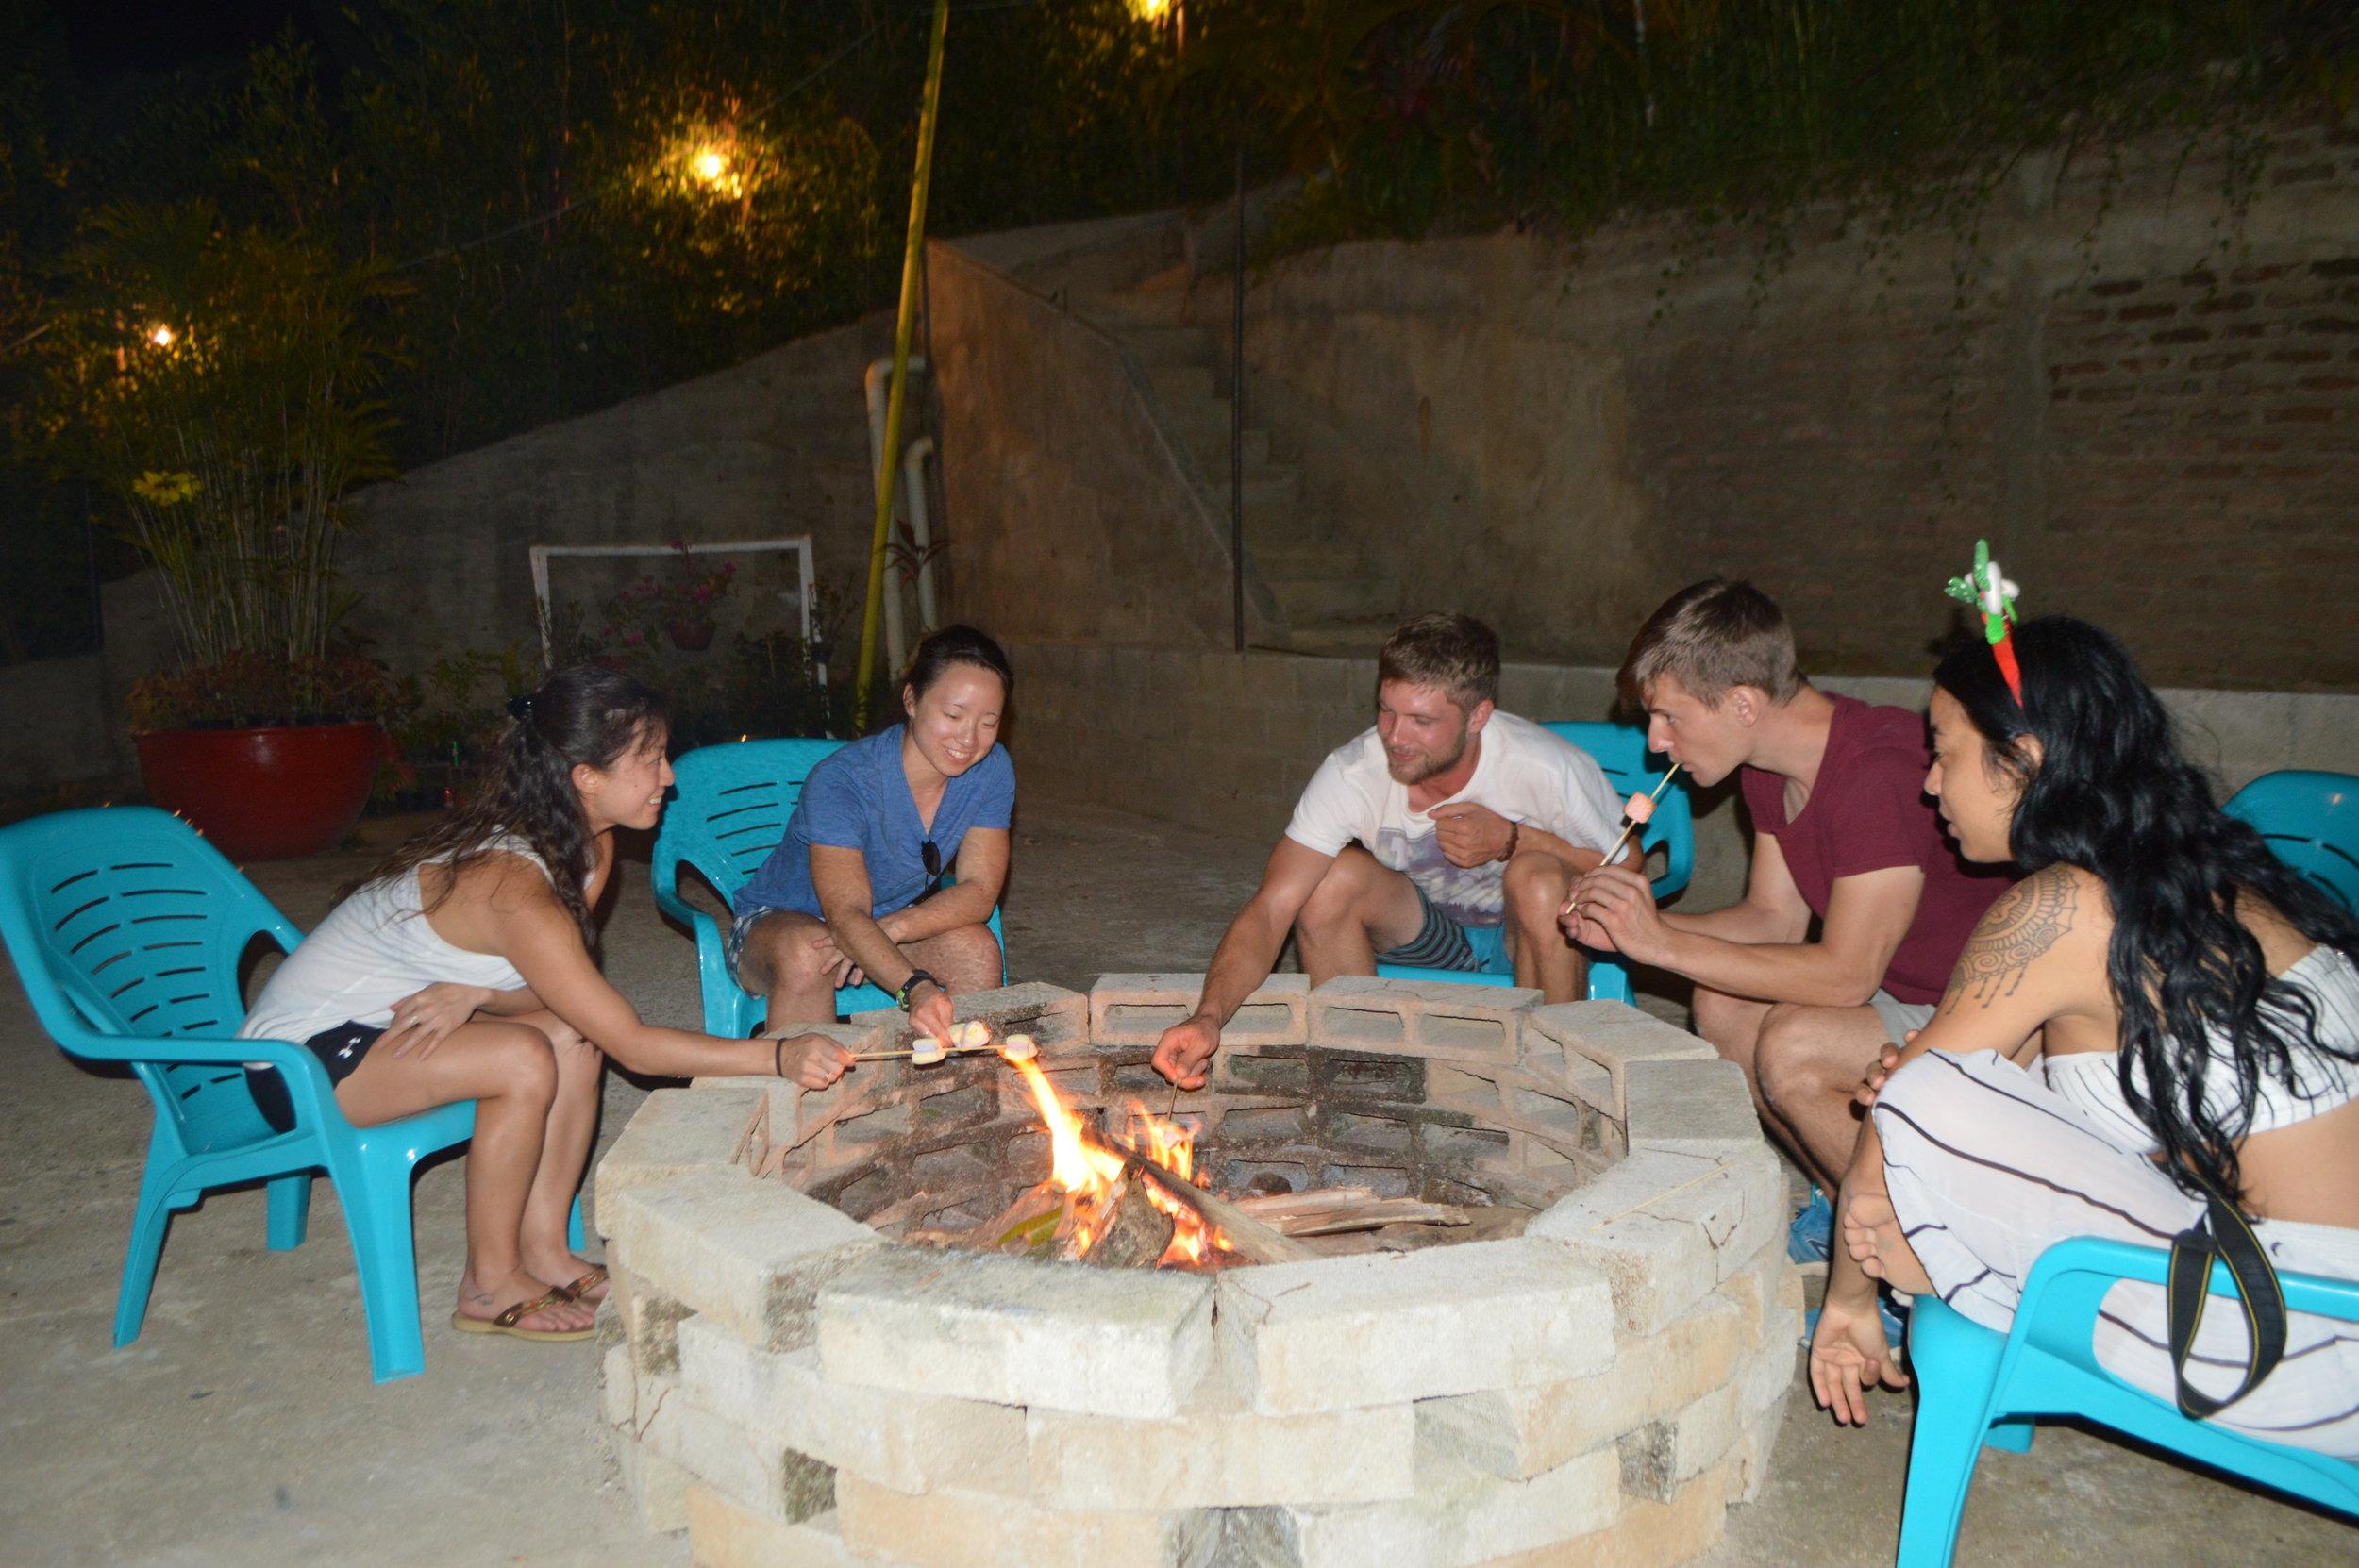 Bonfire in the courtyard